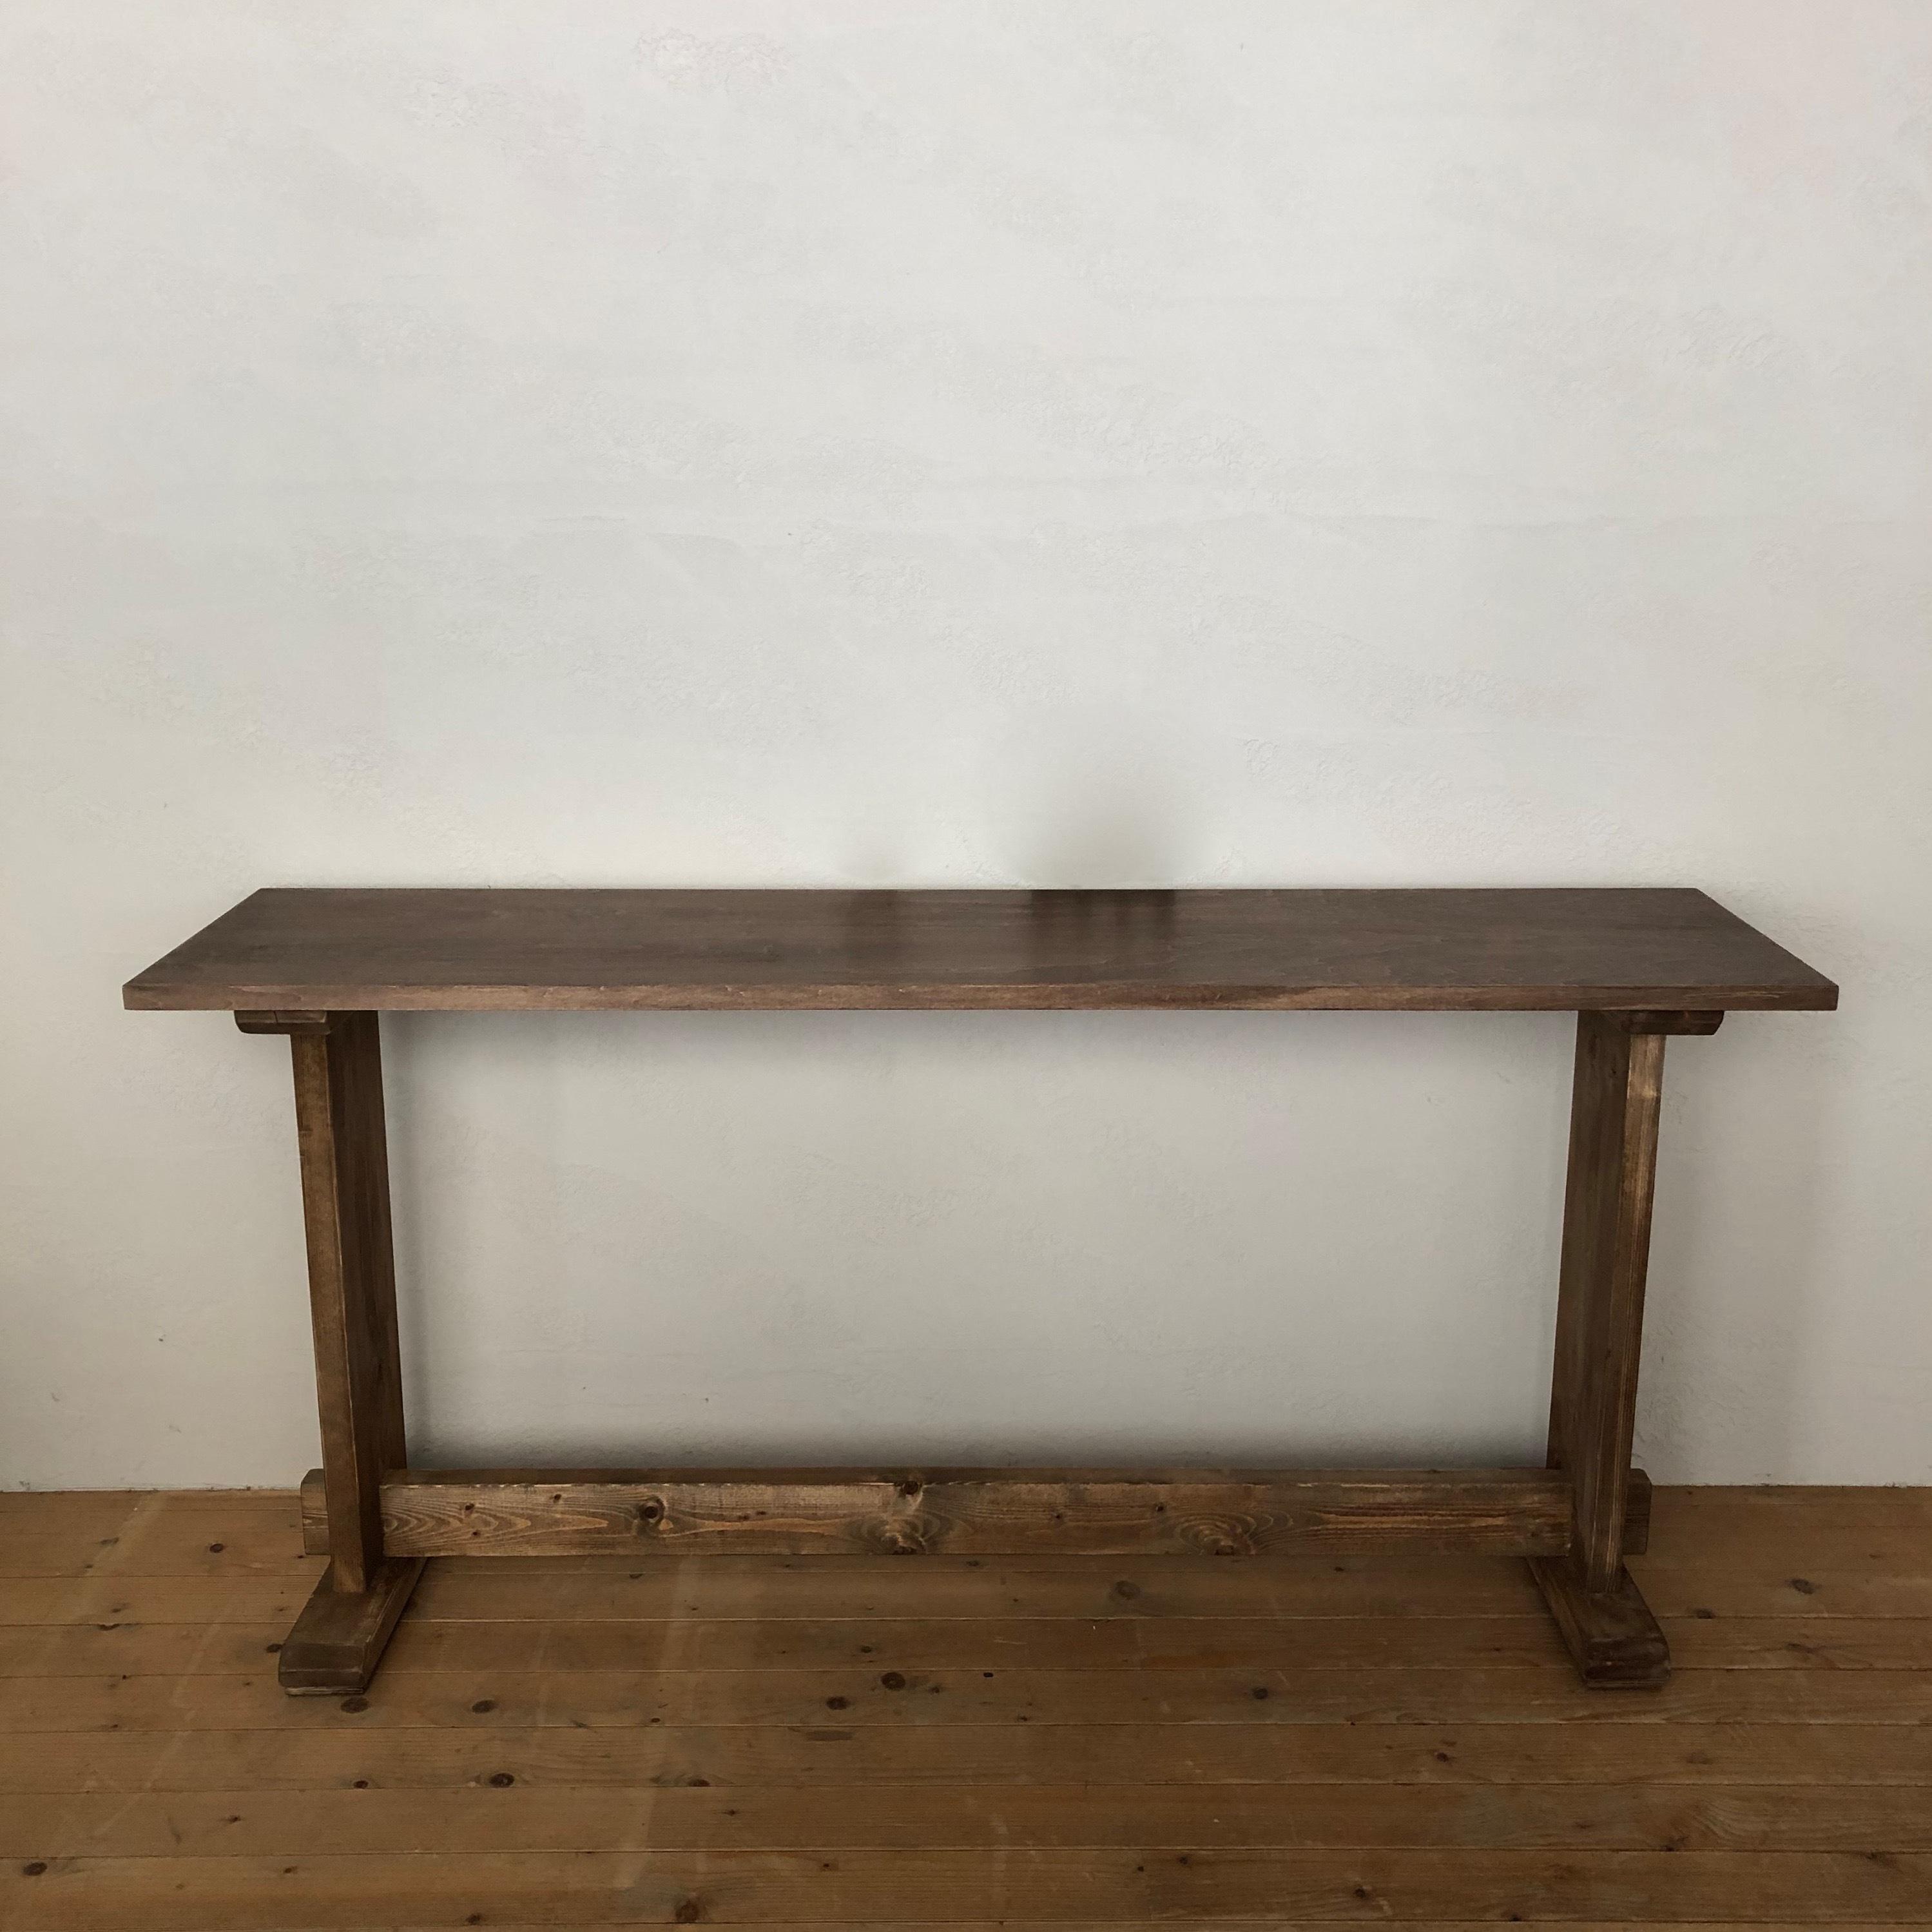 Original CONSOLE TABLE